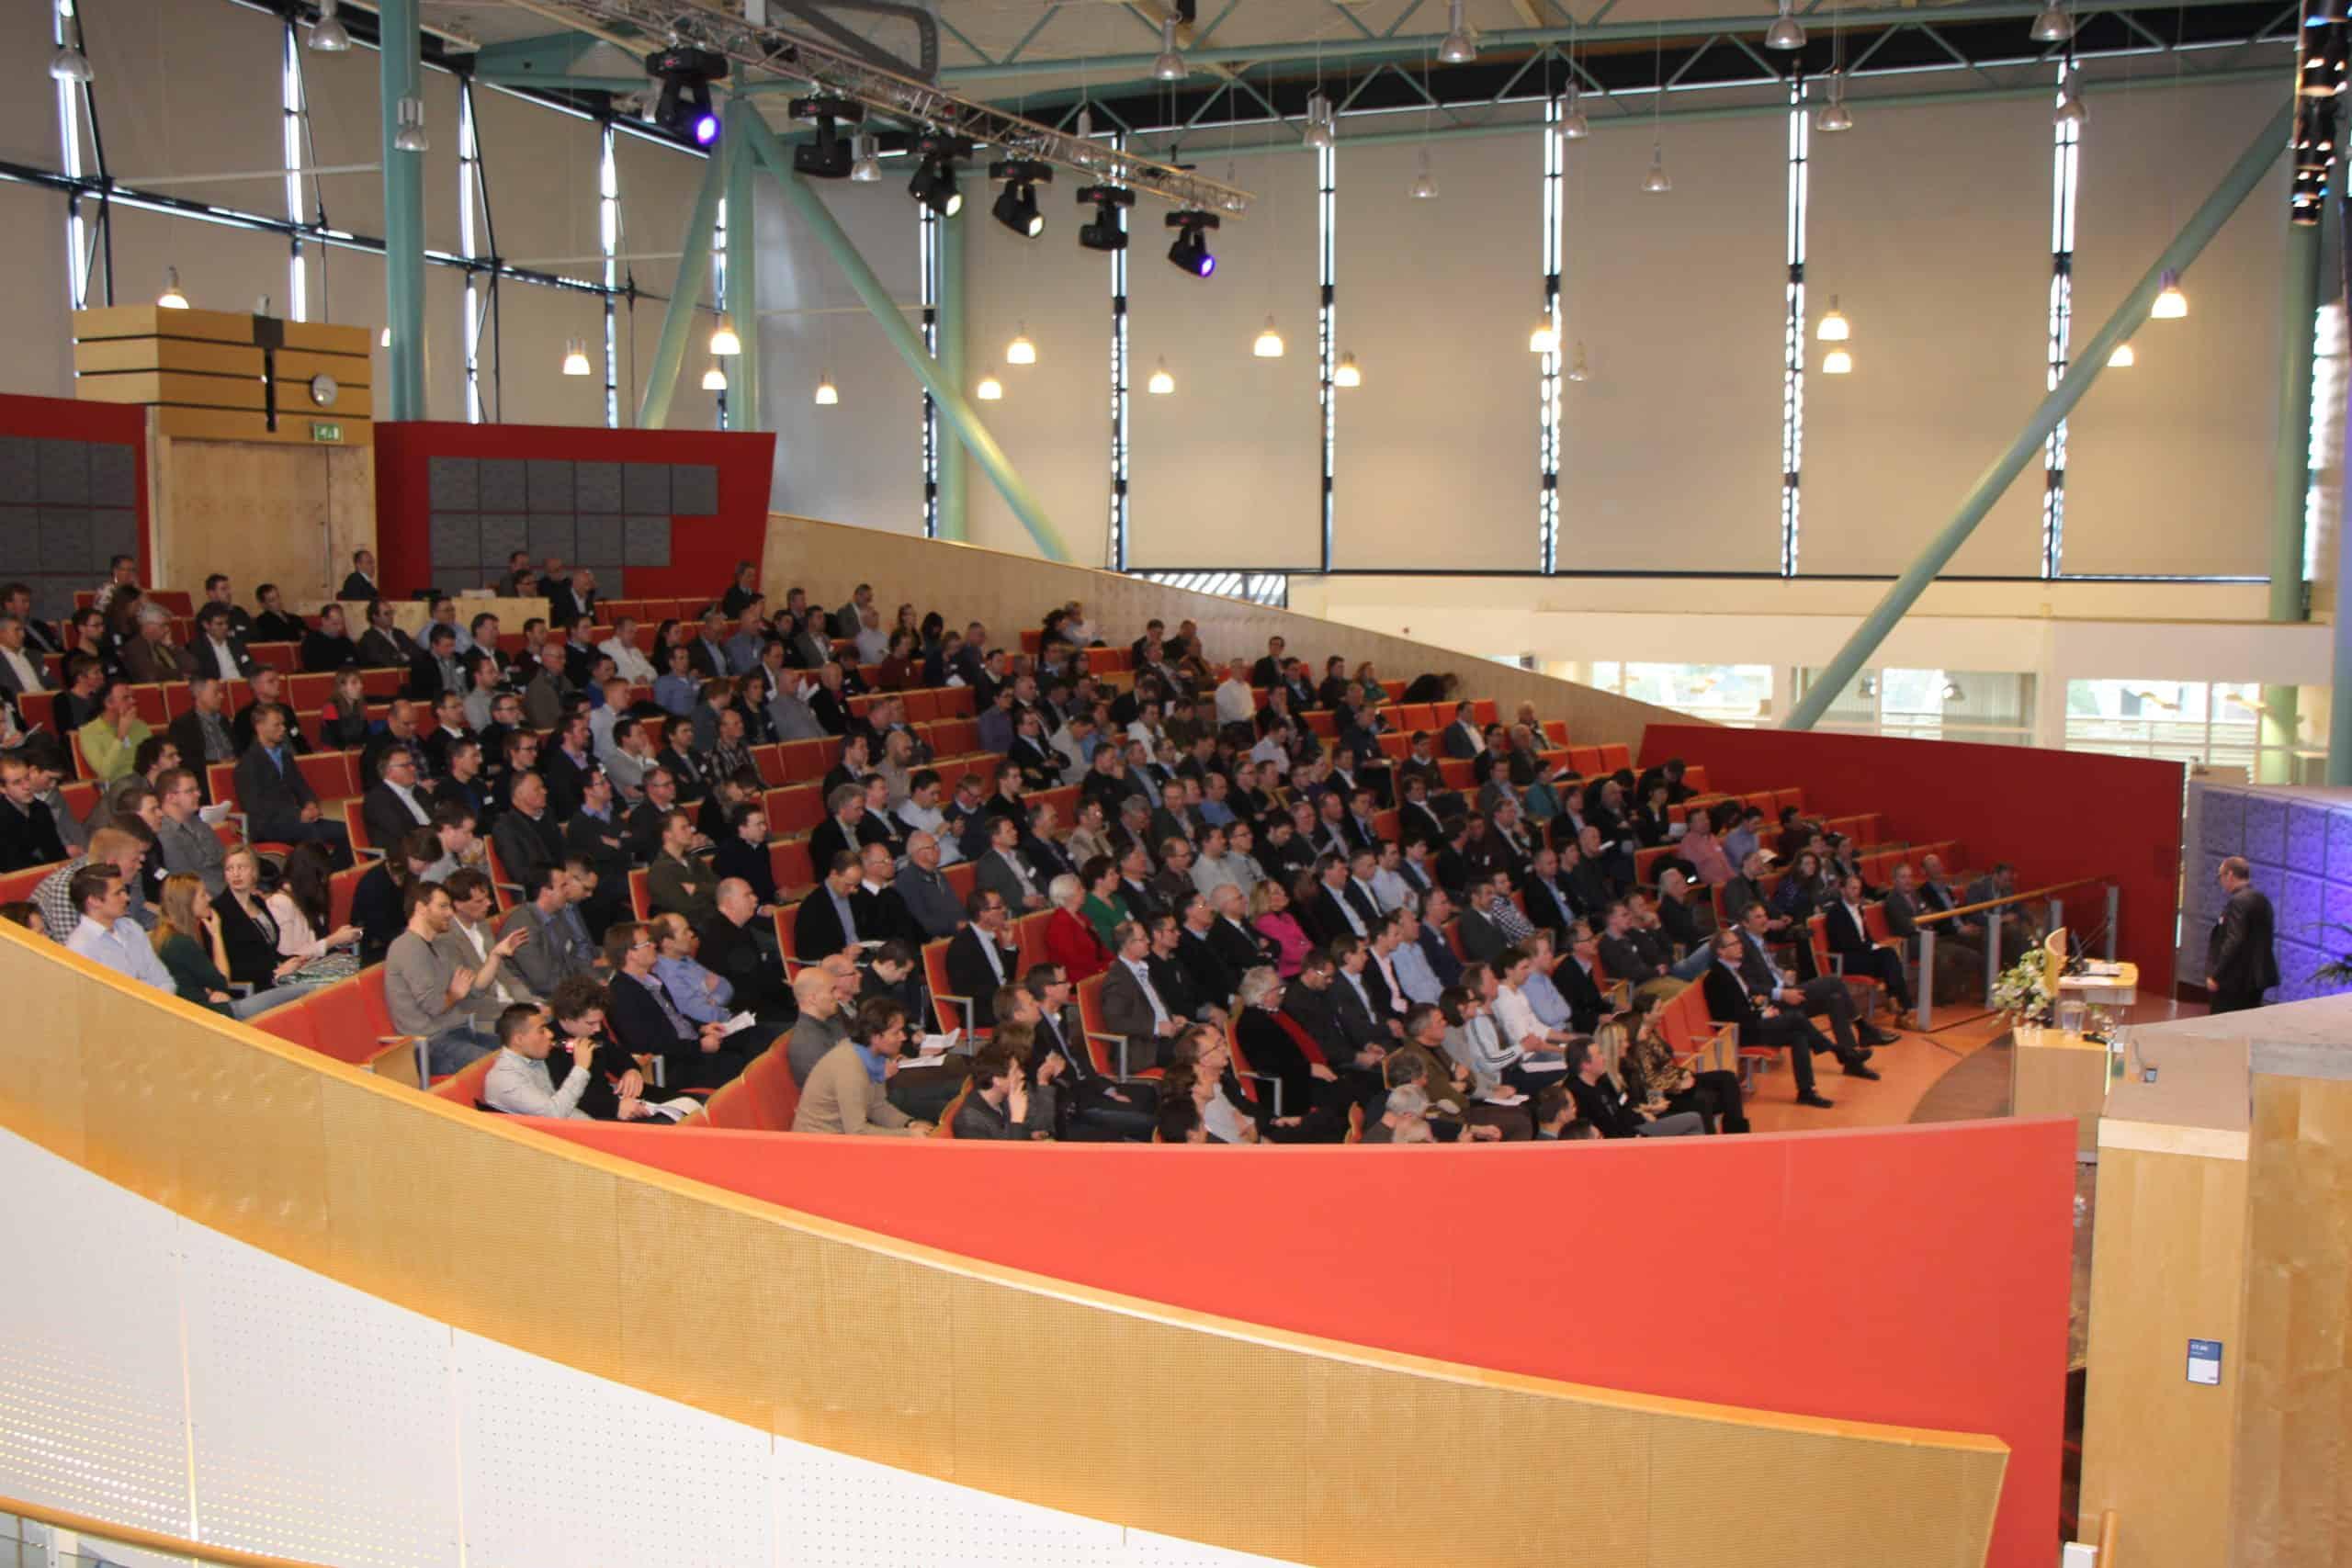 Symposium-Er-gebeurt-iets-moois-in-Zwolle-sfeerimpressie-auditorium-1-scaled